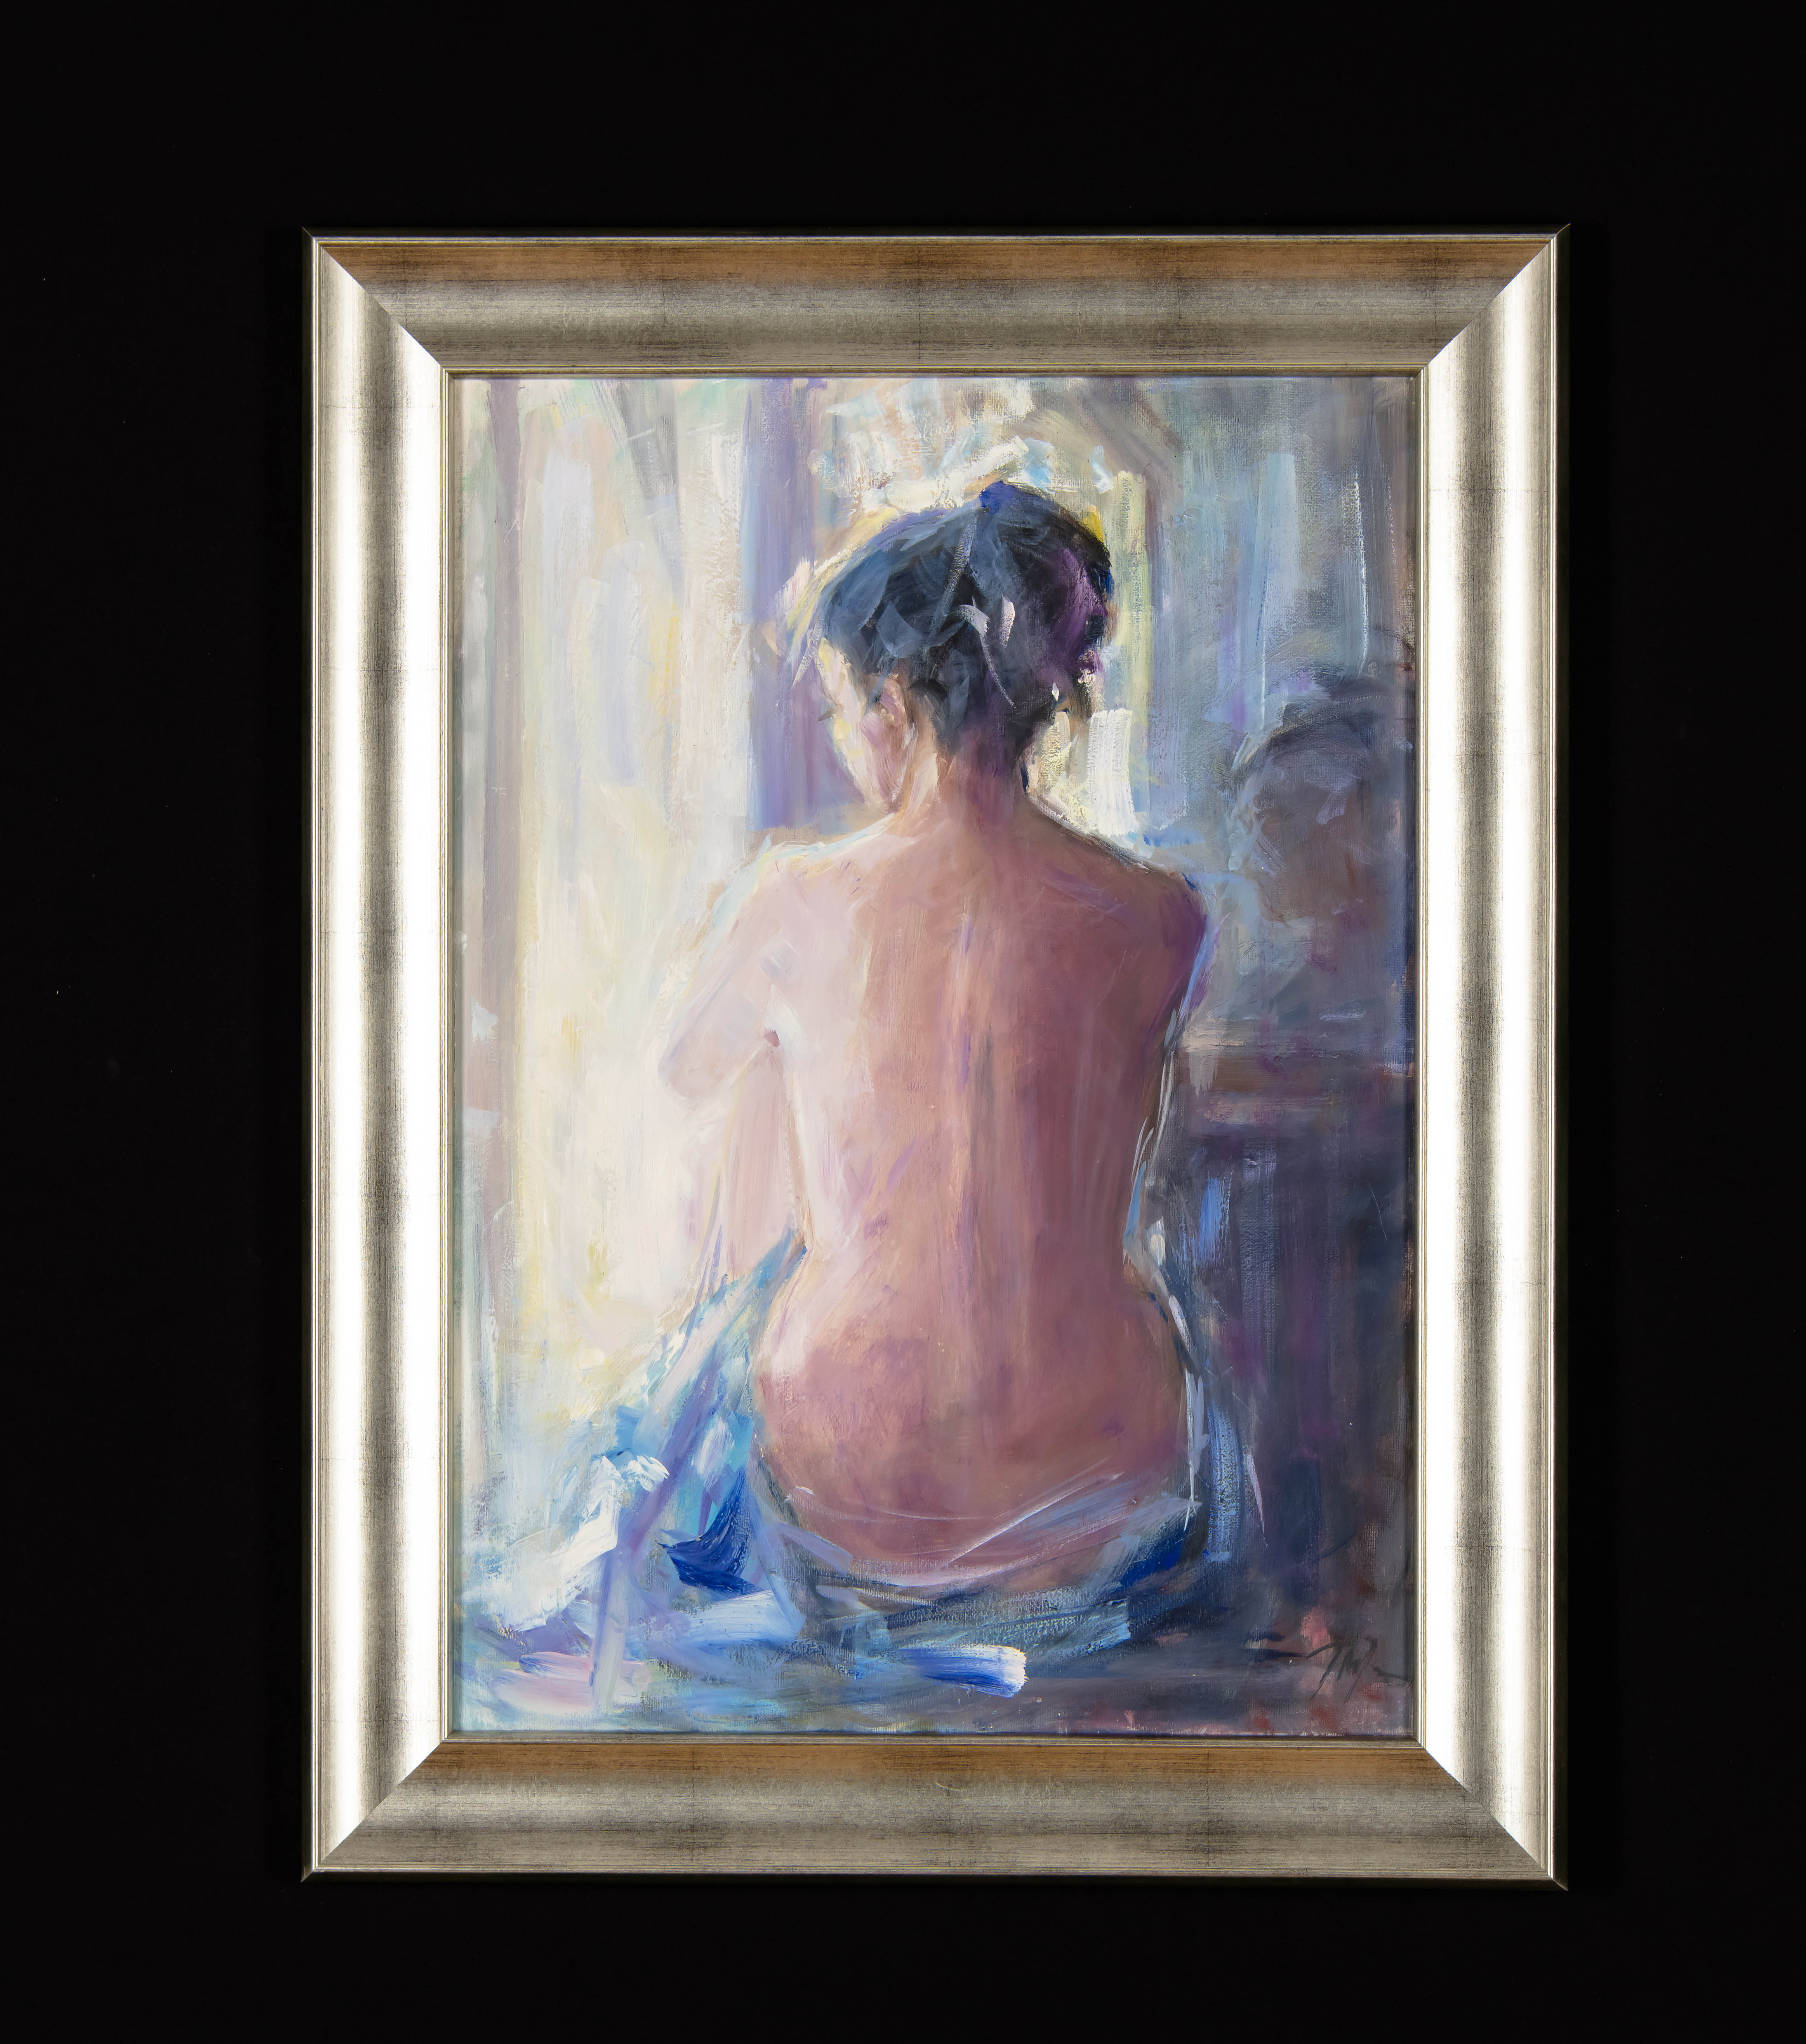 """Akt niebieski"", 2019"